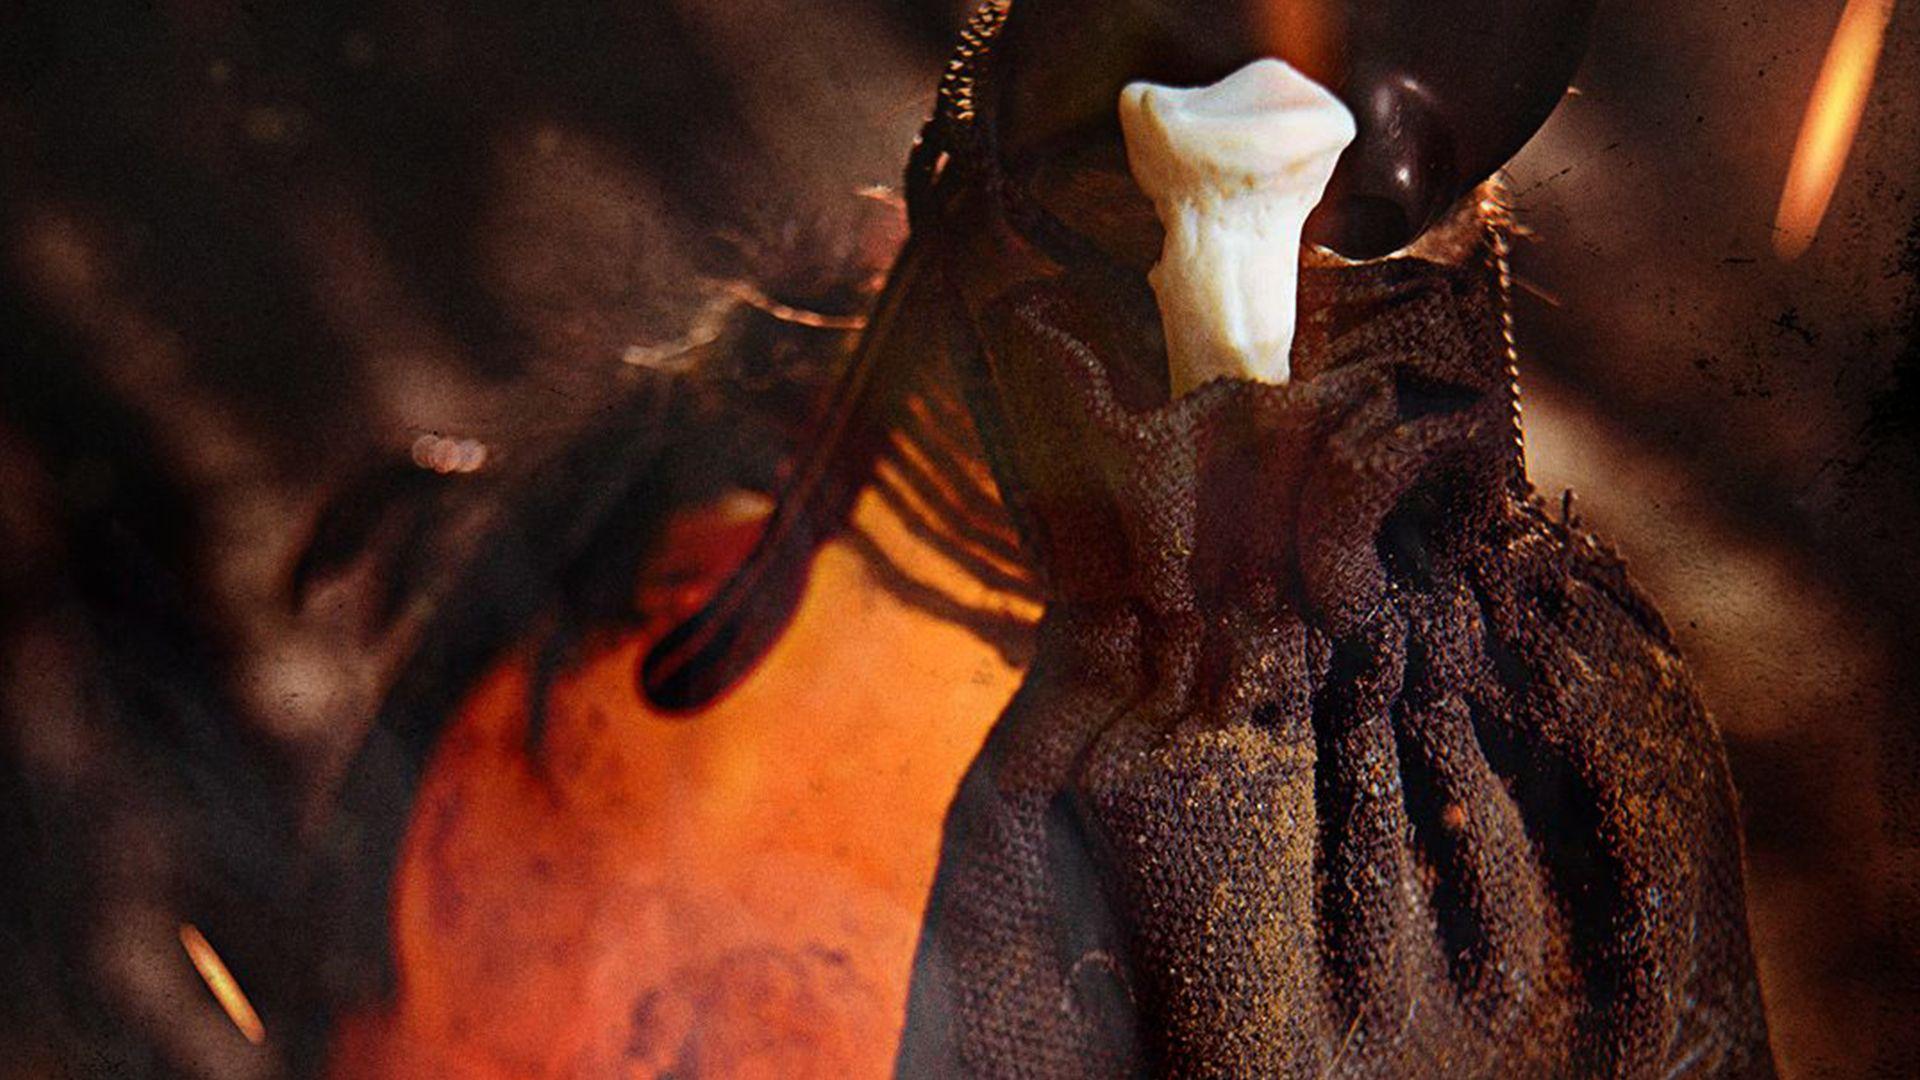 Braue :: Brand Design Experts - Voodoo Priest Volcano4.jpg